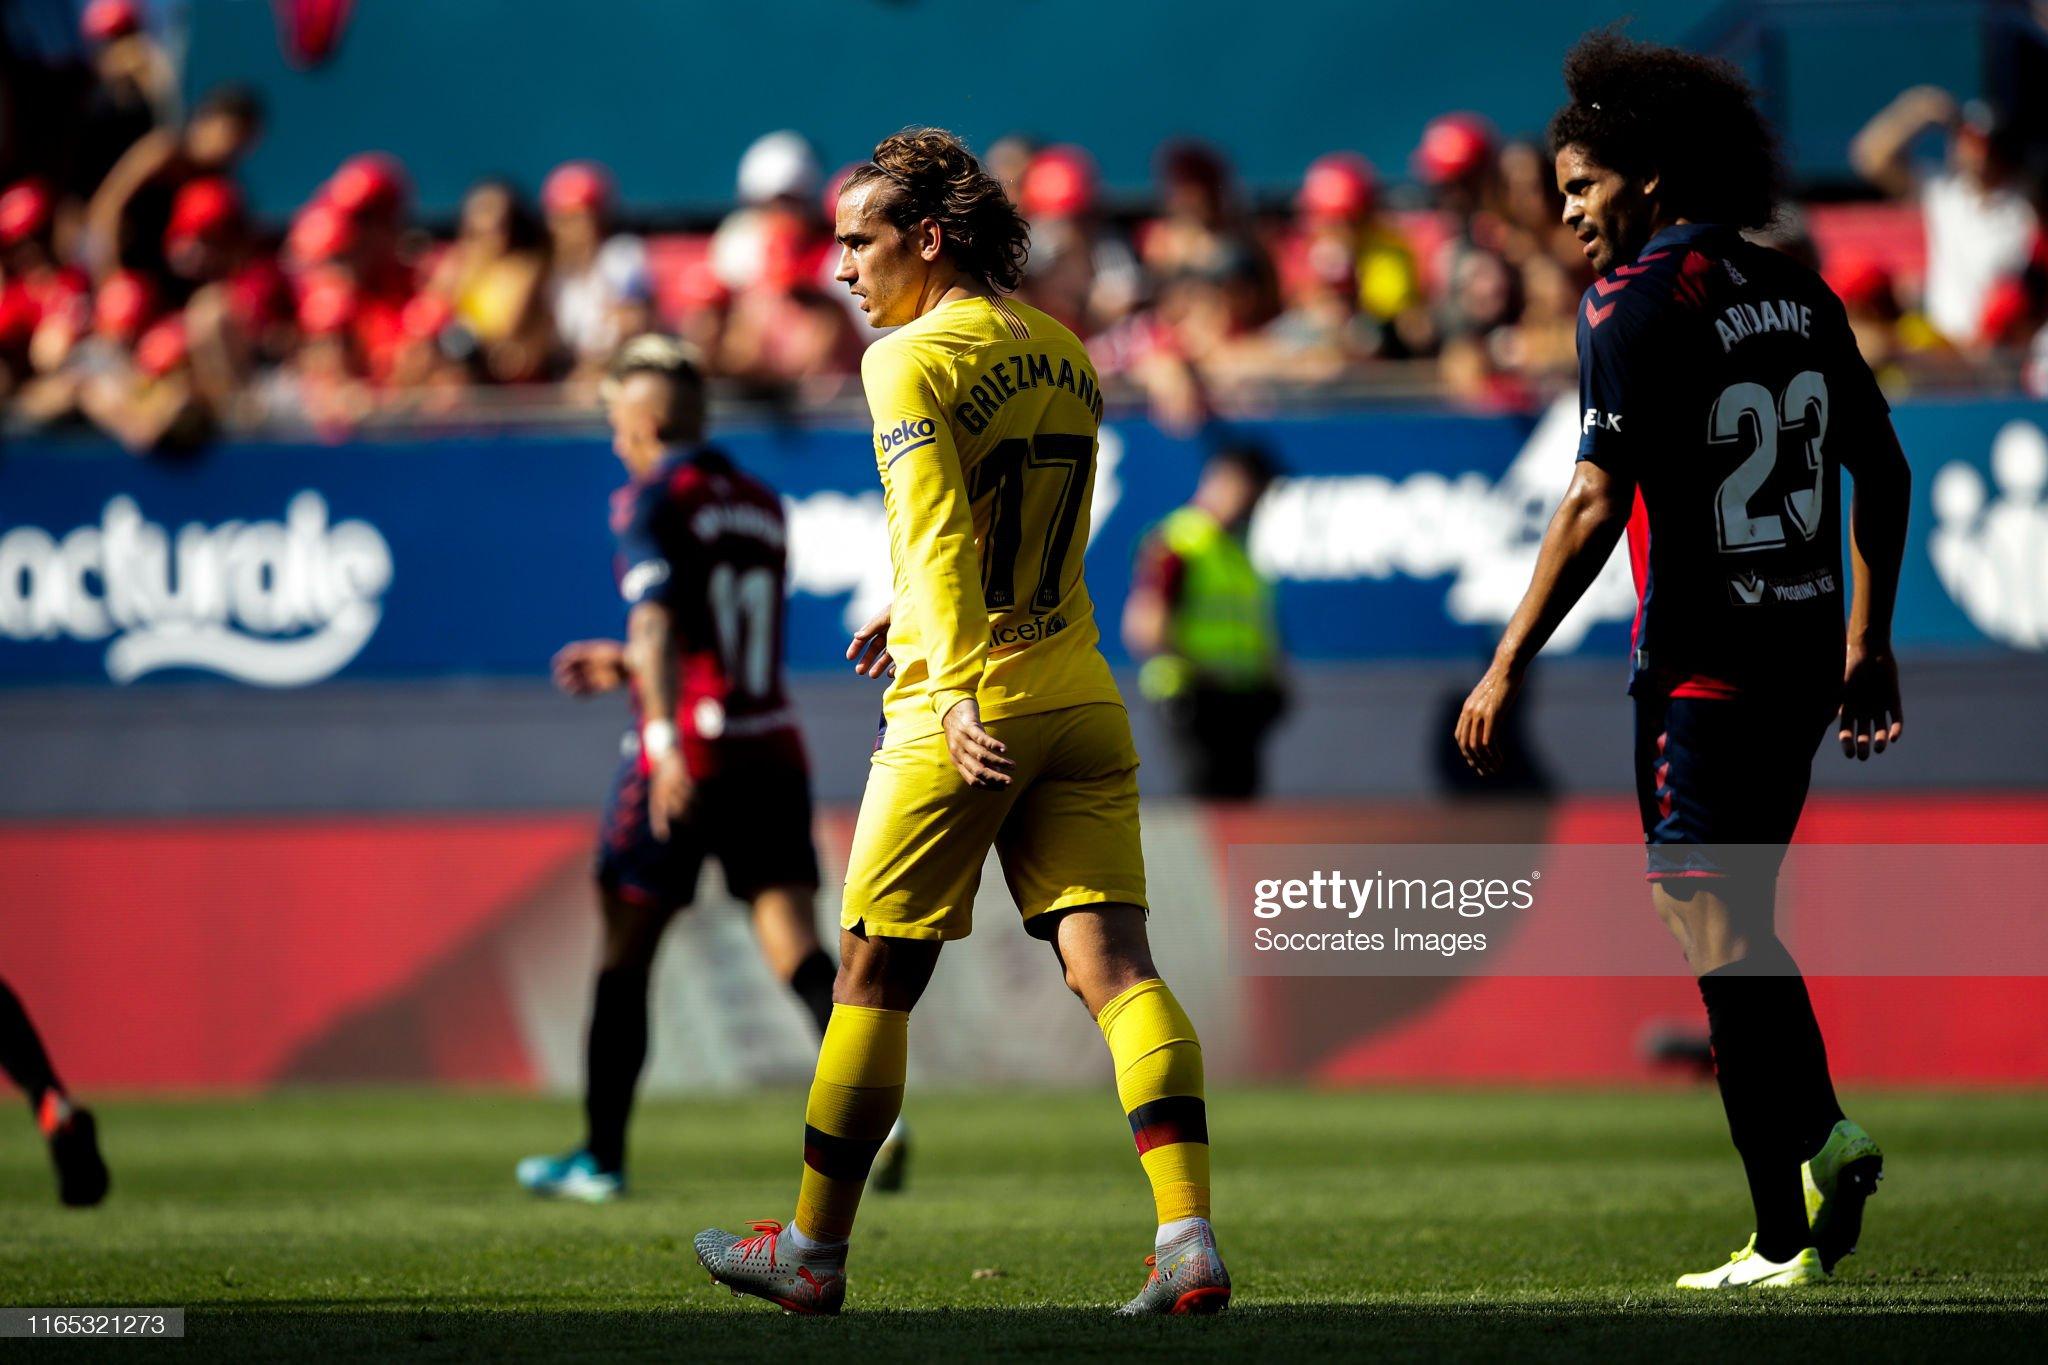 صور مباراة : أوساسونا - برشلونة 2-2 ( 31-08-2019 )  Antoine-griezmann-of-fc-barcelona-during-the-la-liga-santander-match-picture-id1165321273?s=2048x2048